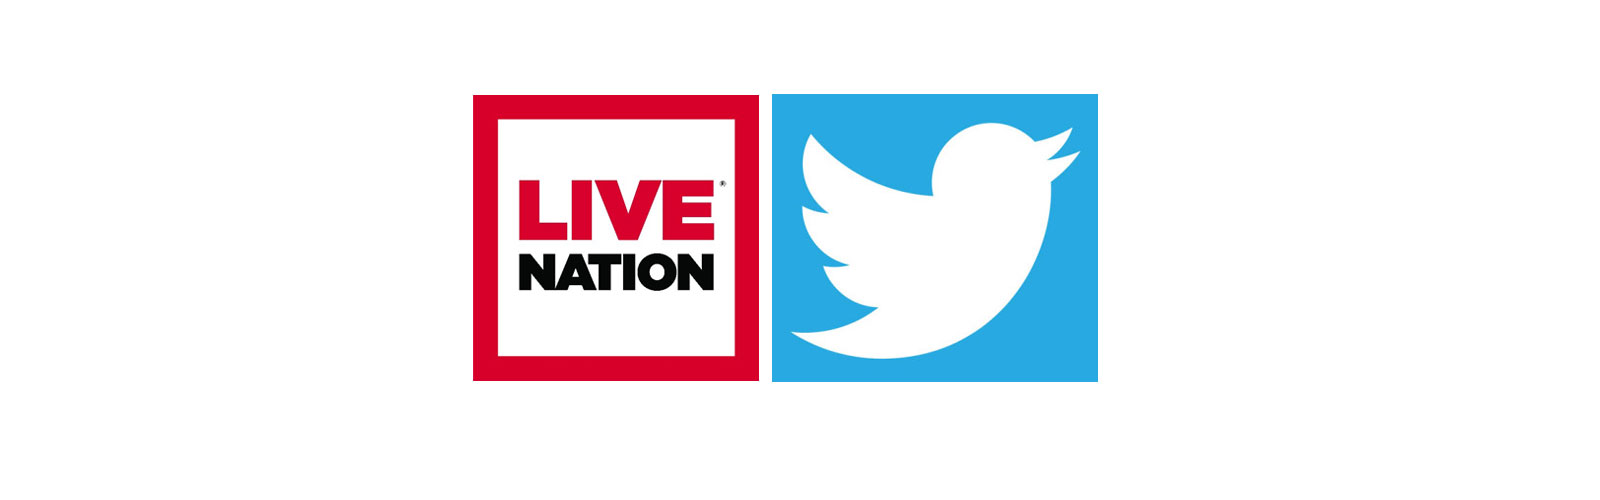 live-nation-twitter